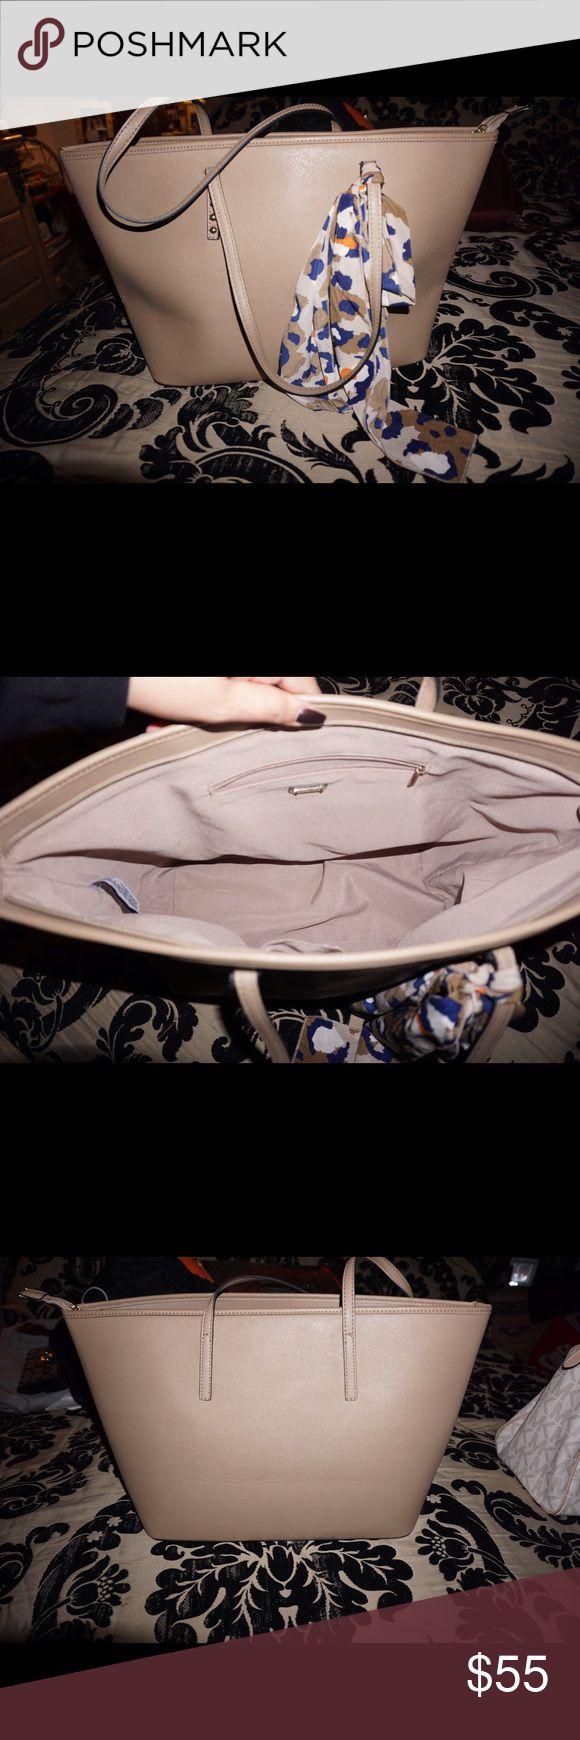 ❗️Reduced❗️Aldo tote bag! Beautiful bag for those of you who love big purses/ book bags. Aldo Bags Totes